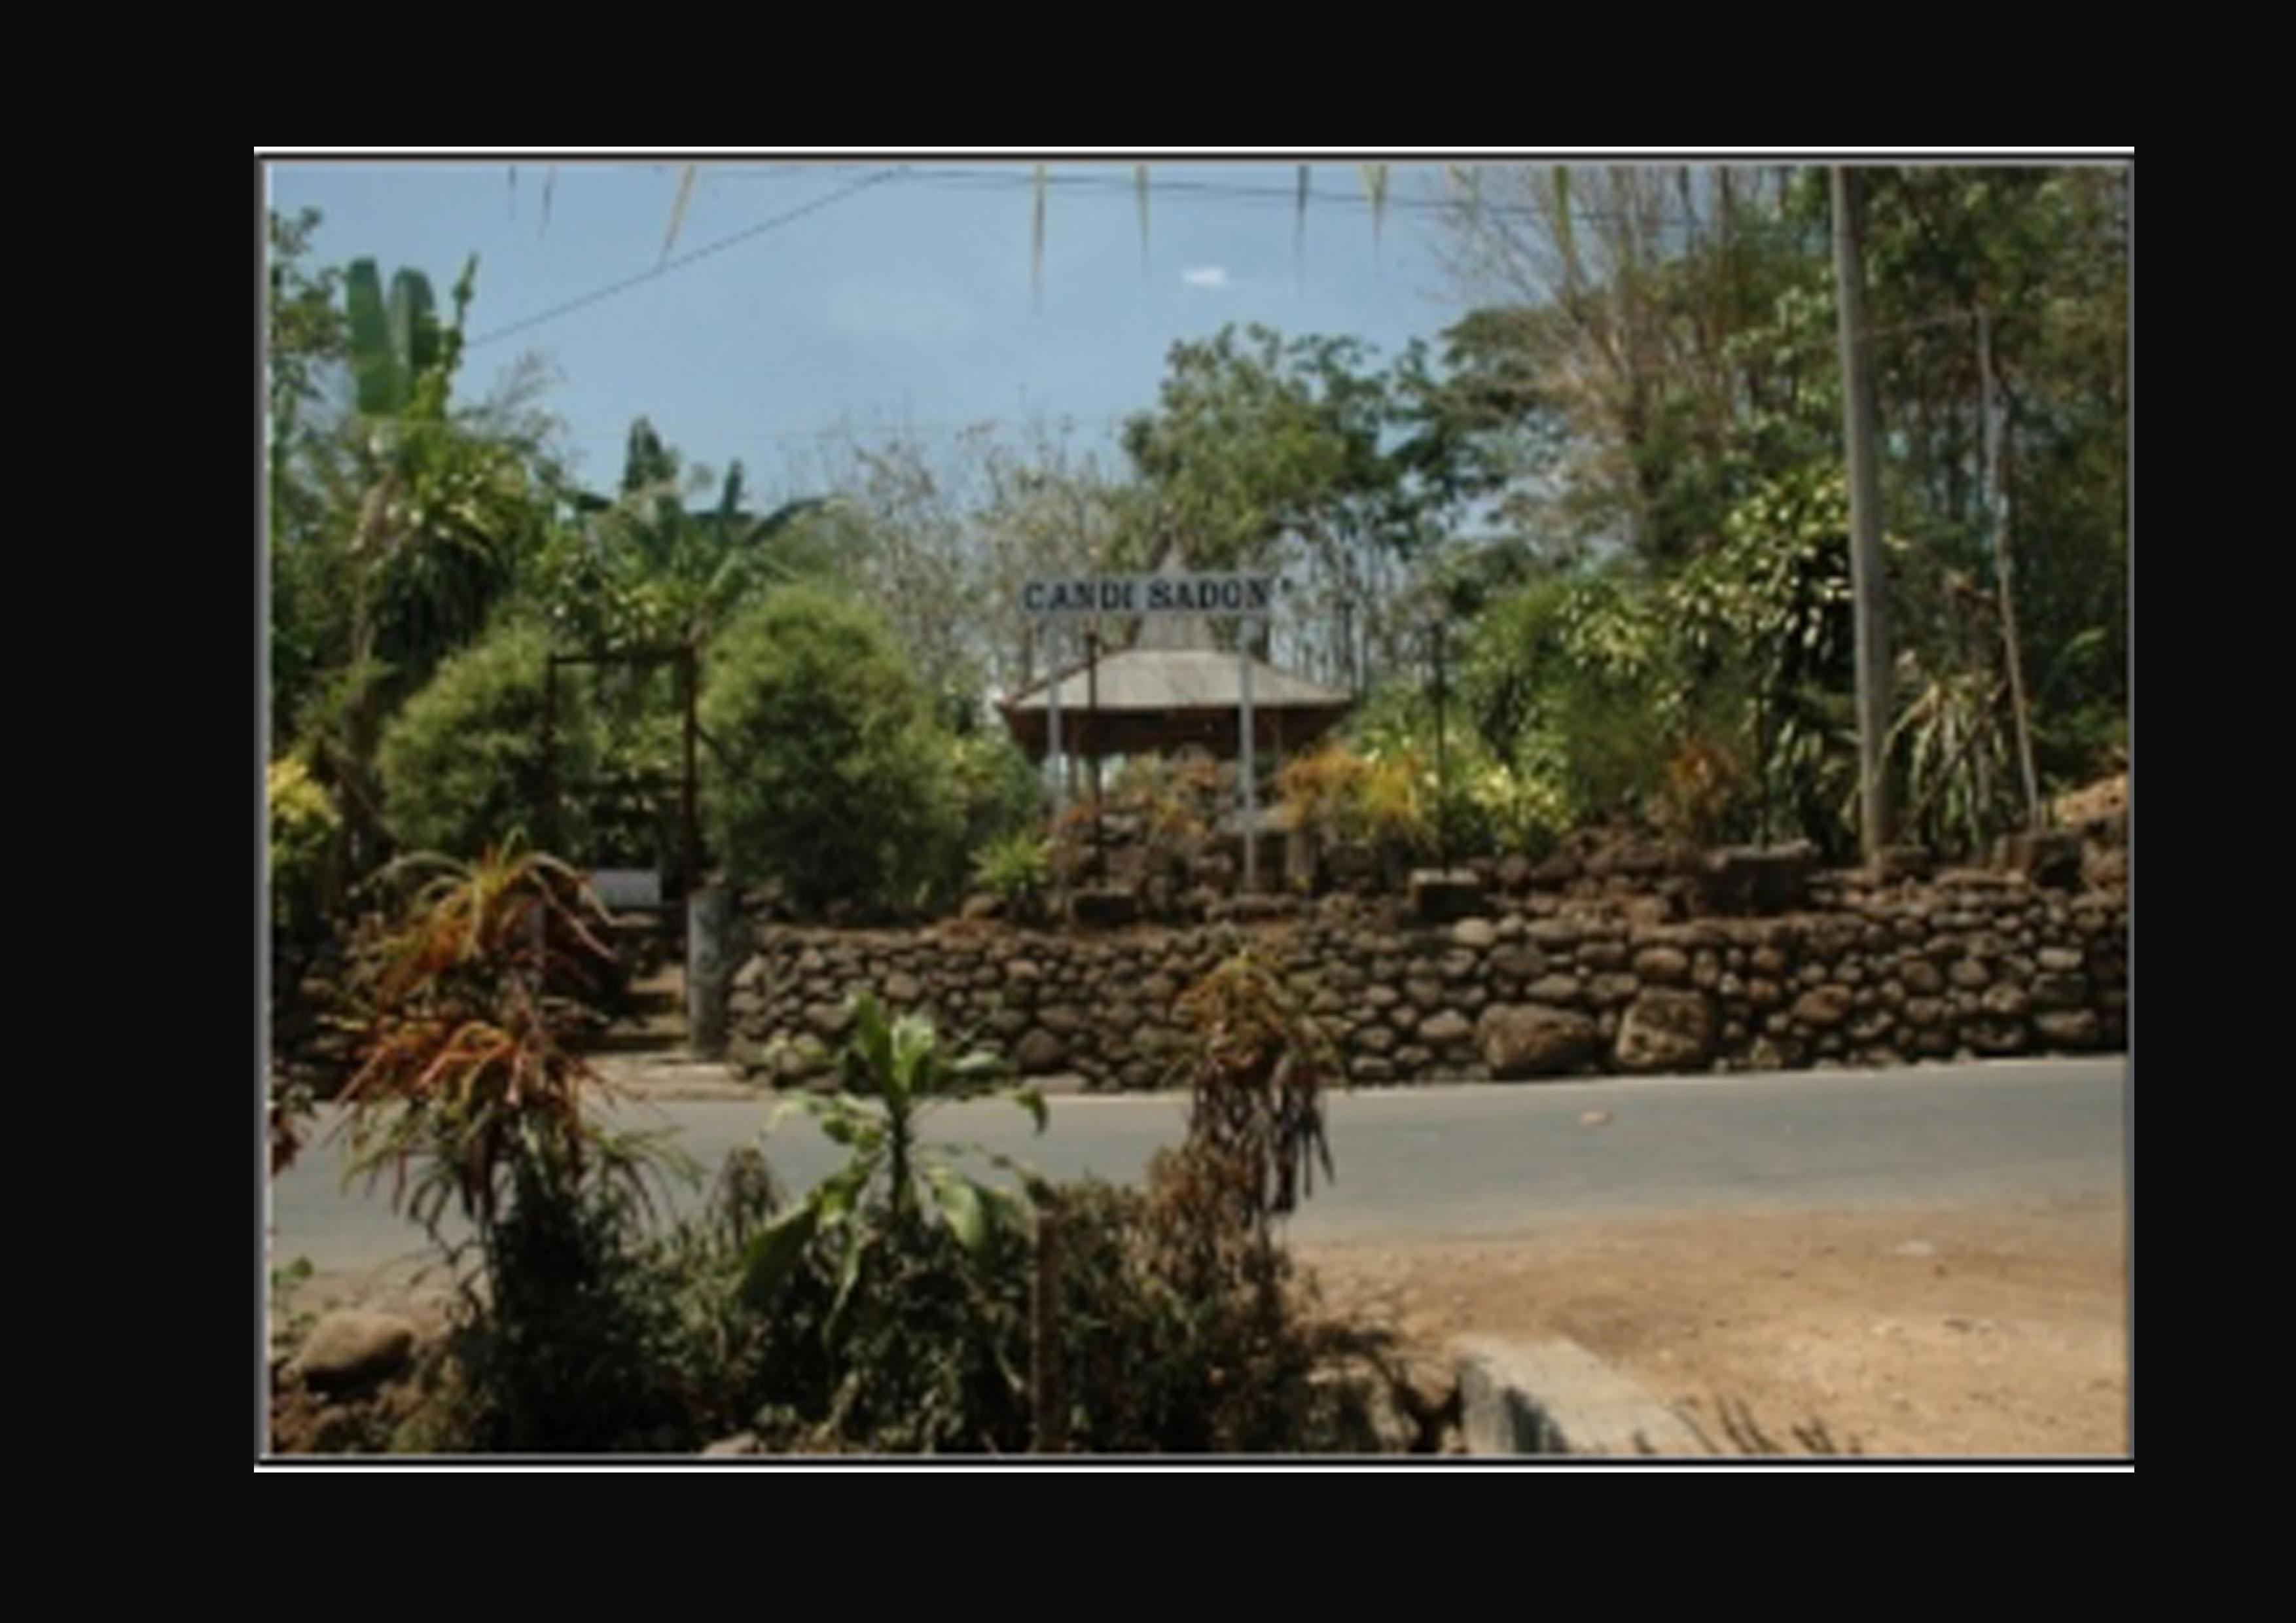 Candi Sadon Balai Pelestarian Cagar Budaya Jawa Timur Terletak Dusun